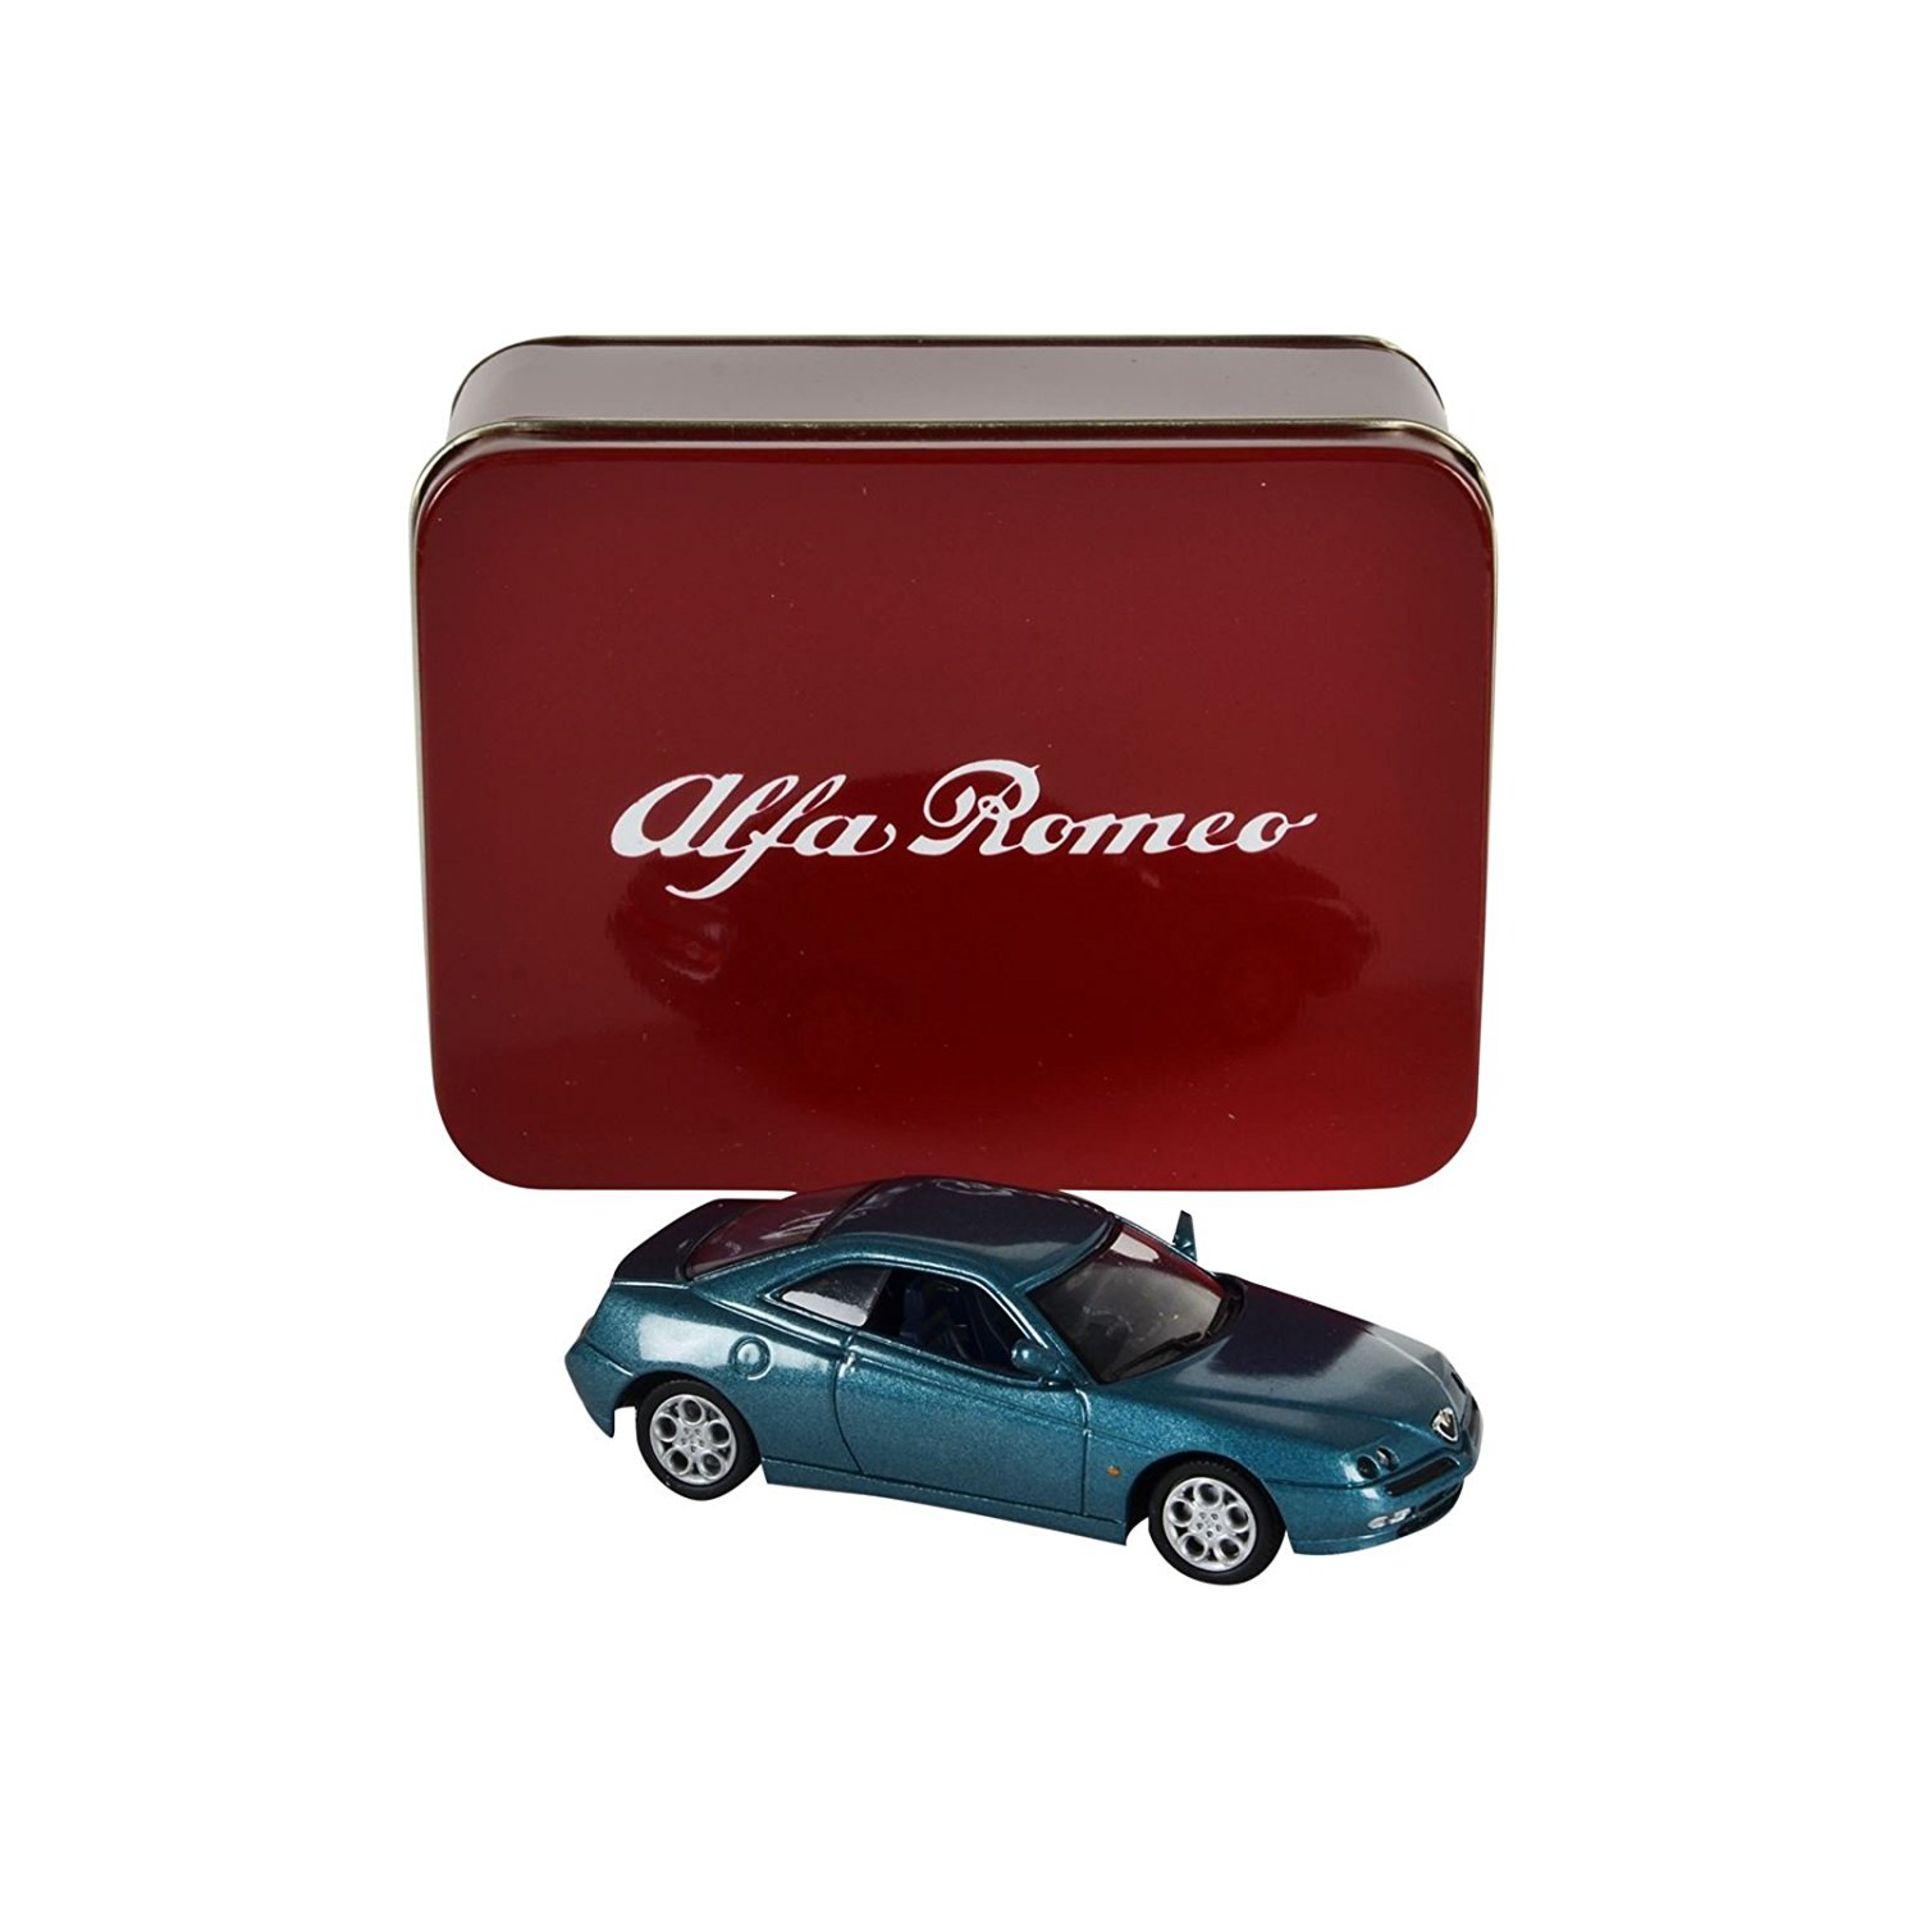 Lot 10373 - V Brand New 1/43 Diecast Model 1995 Alfa Romeo GTV - RRP £14.99